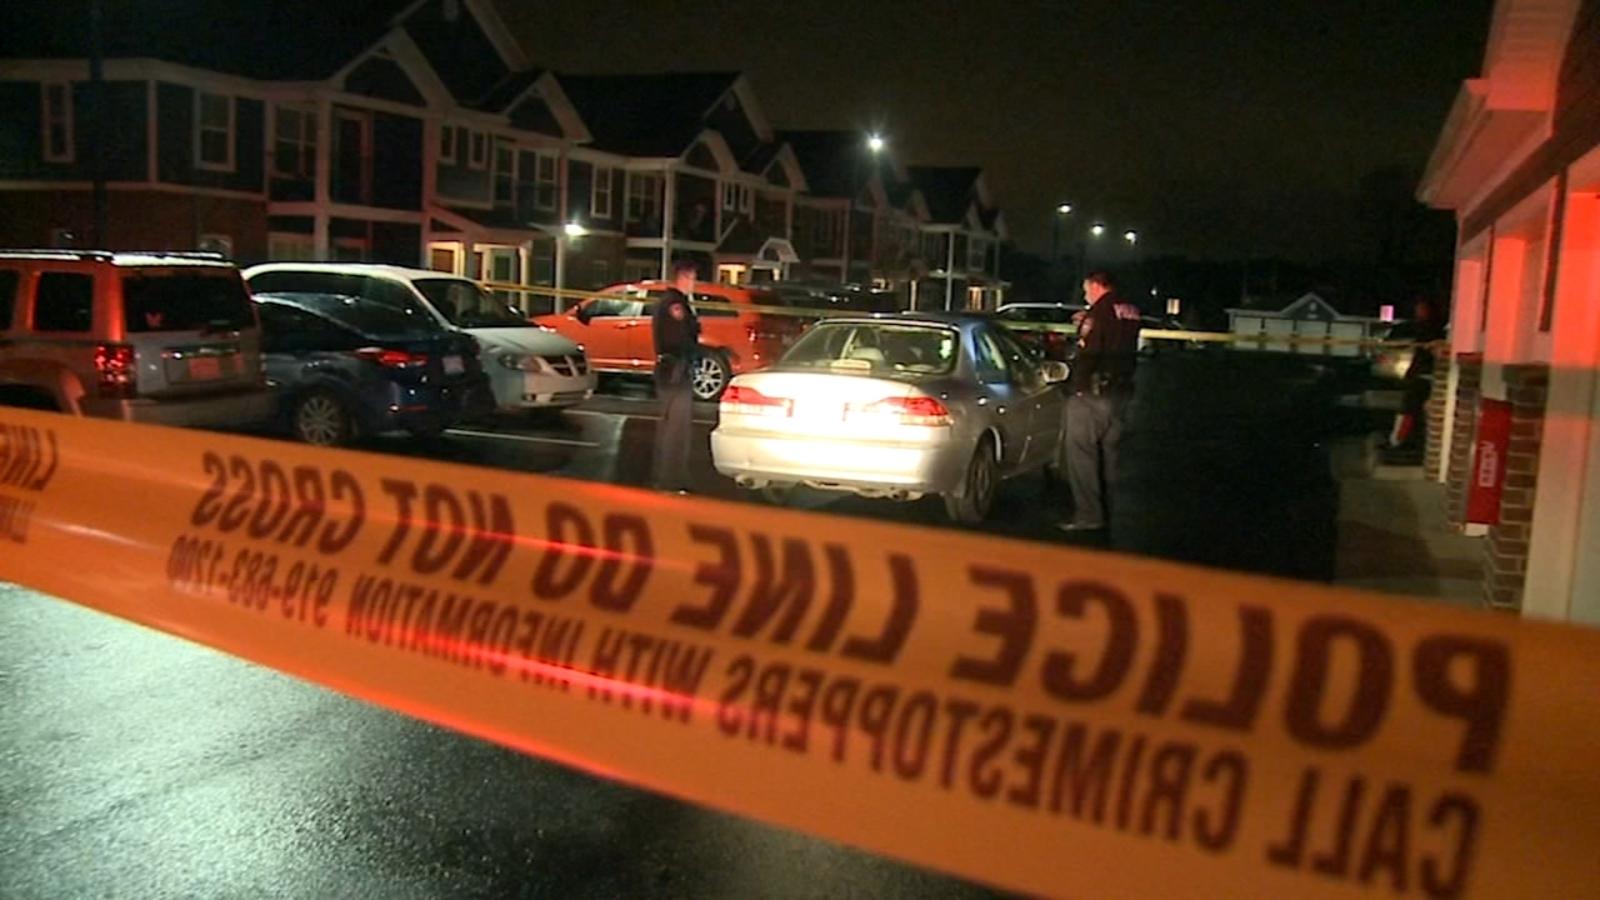 14 Year Old Boy Seriously Injured In Durham Shooting Abc11 Raleigh Durham